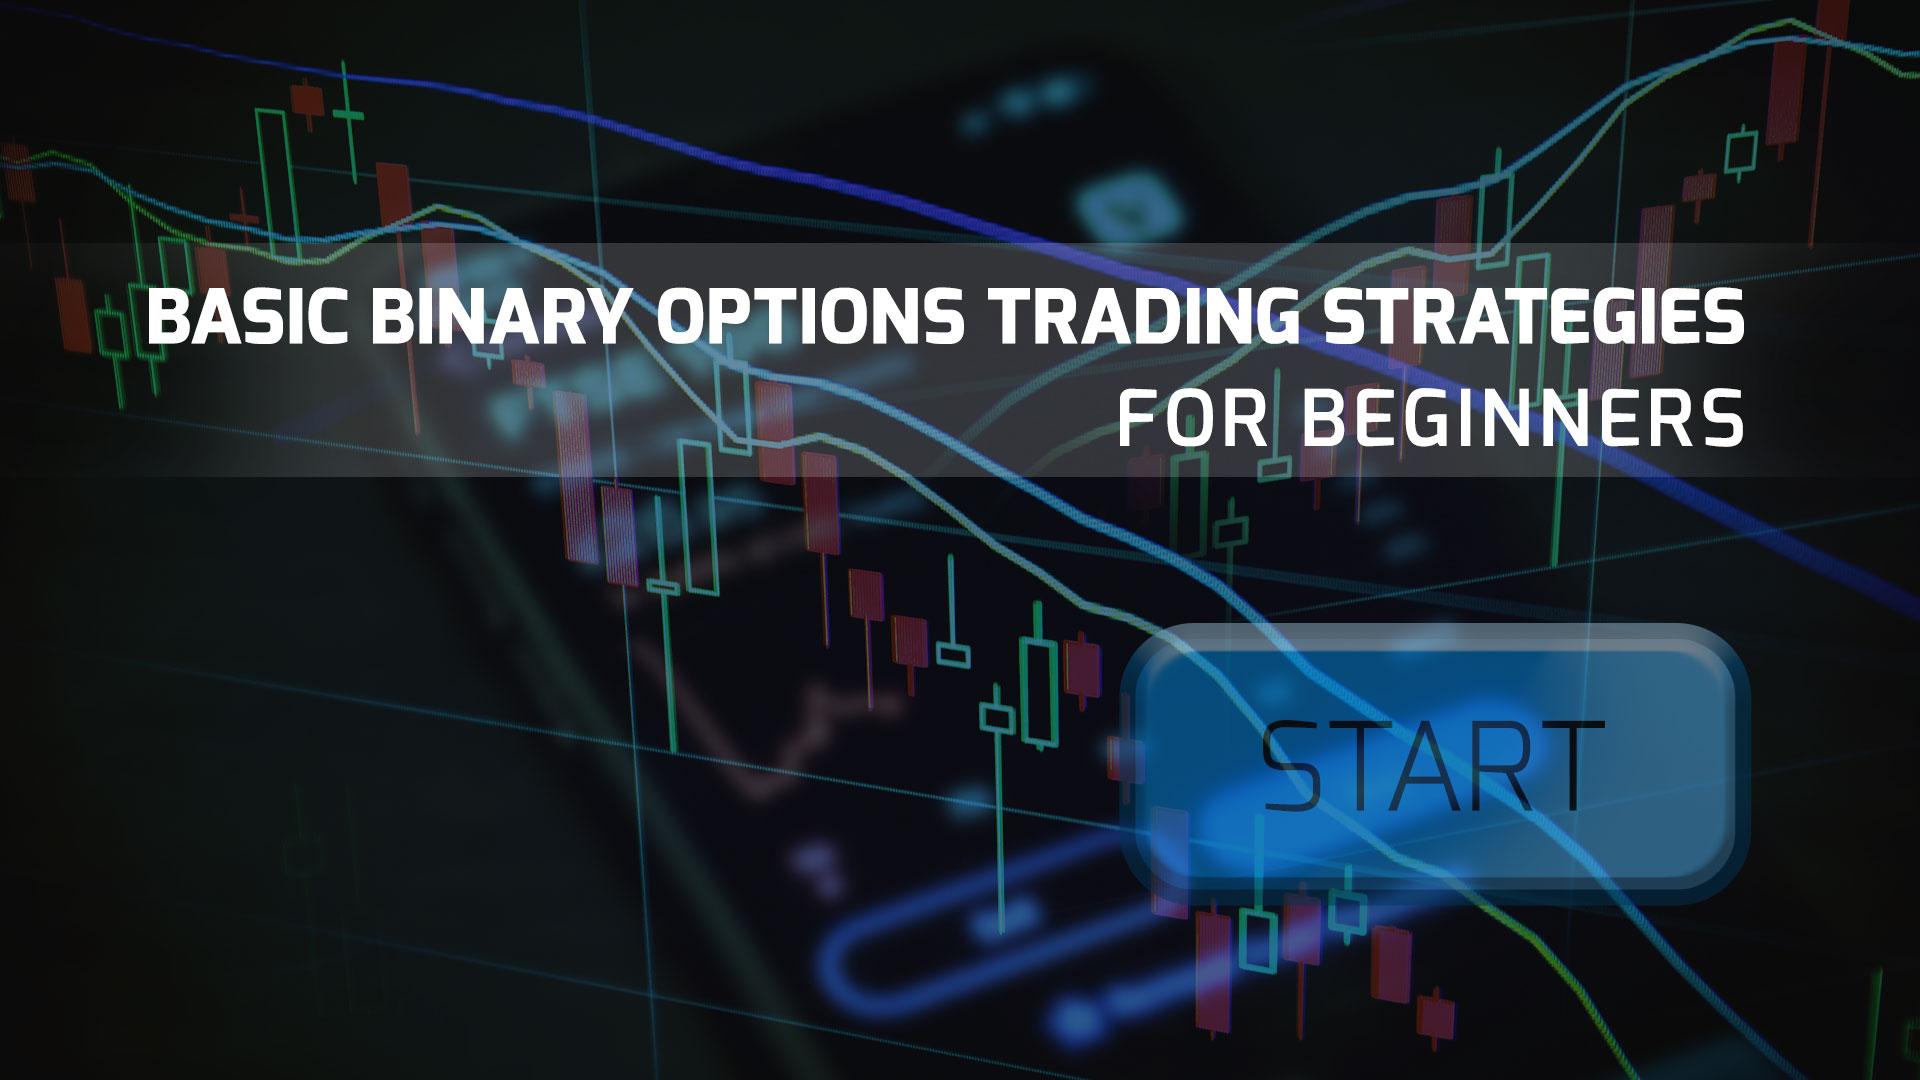 Basic Binary Options Trading Strategies for Beginners